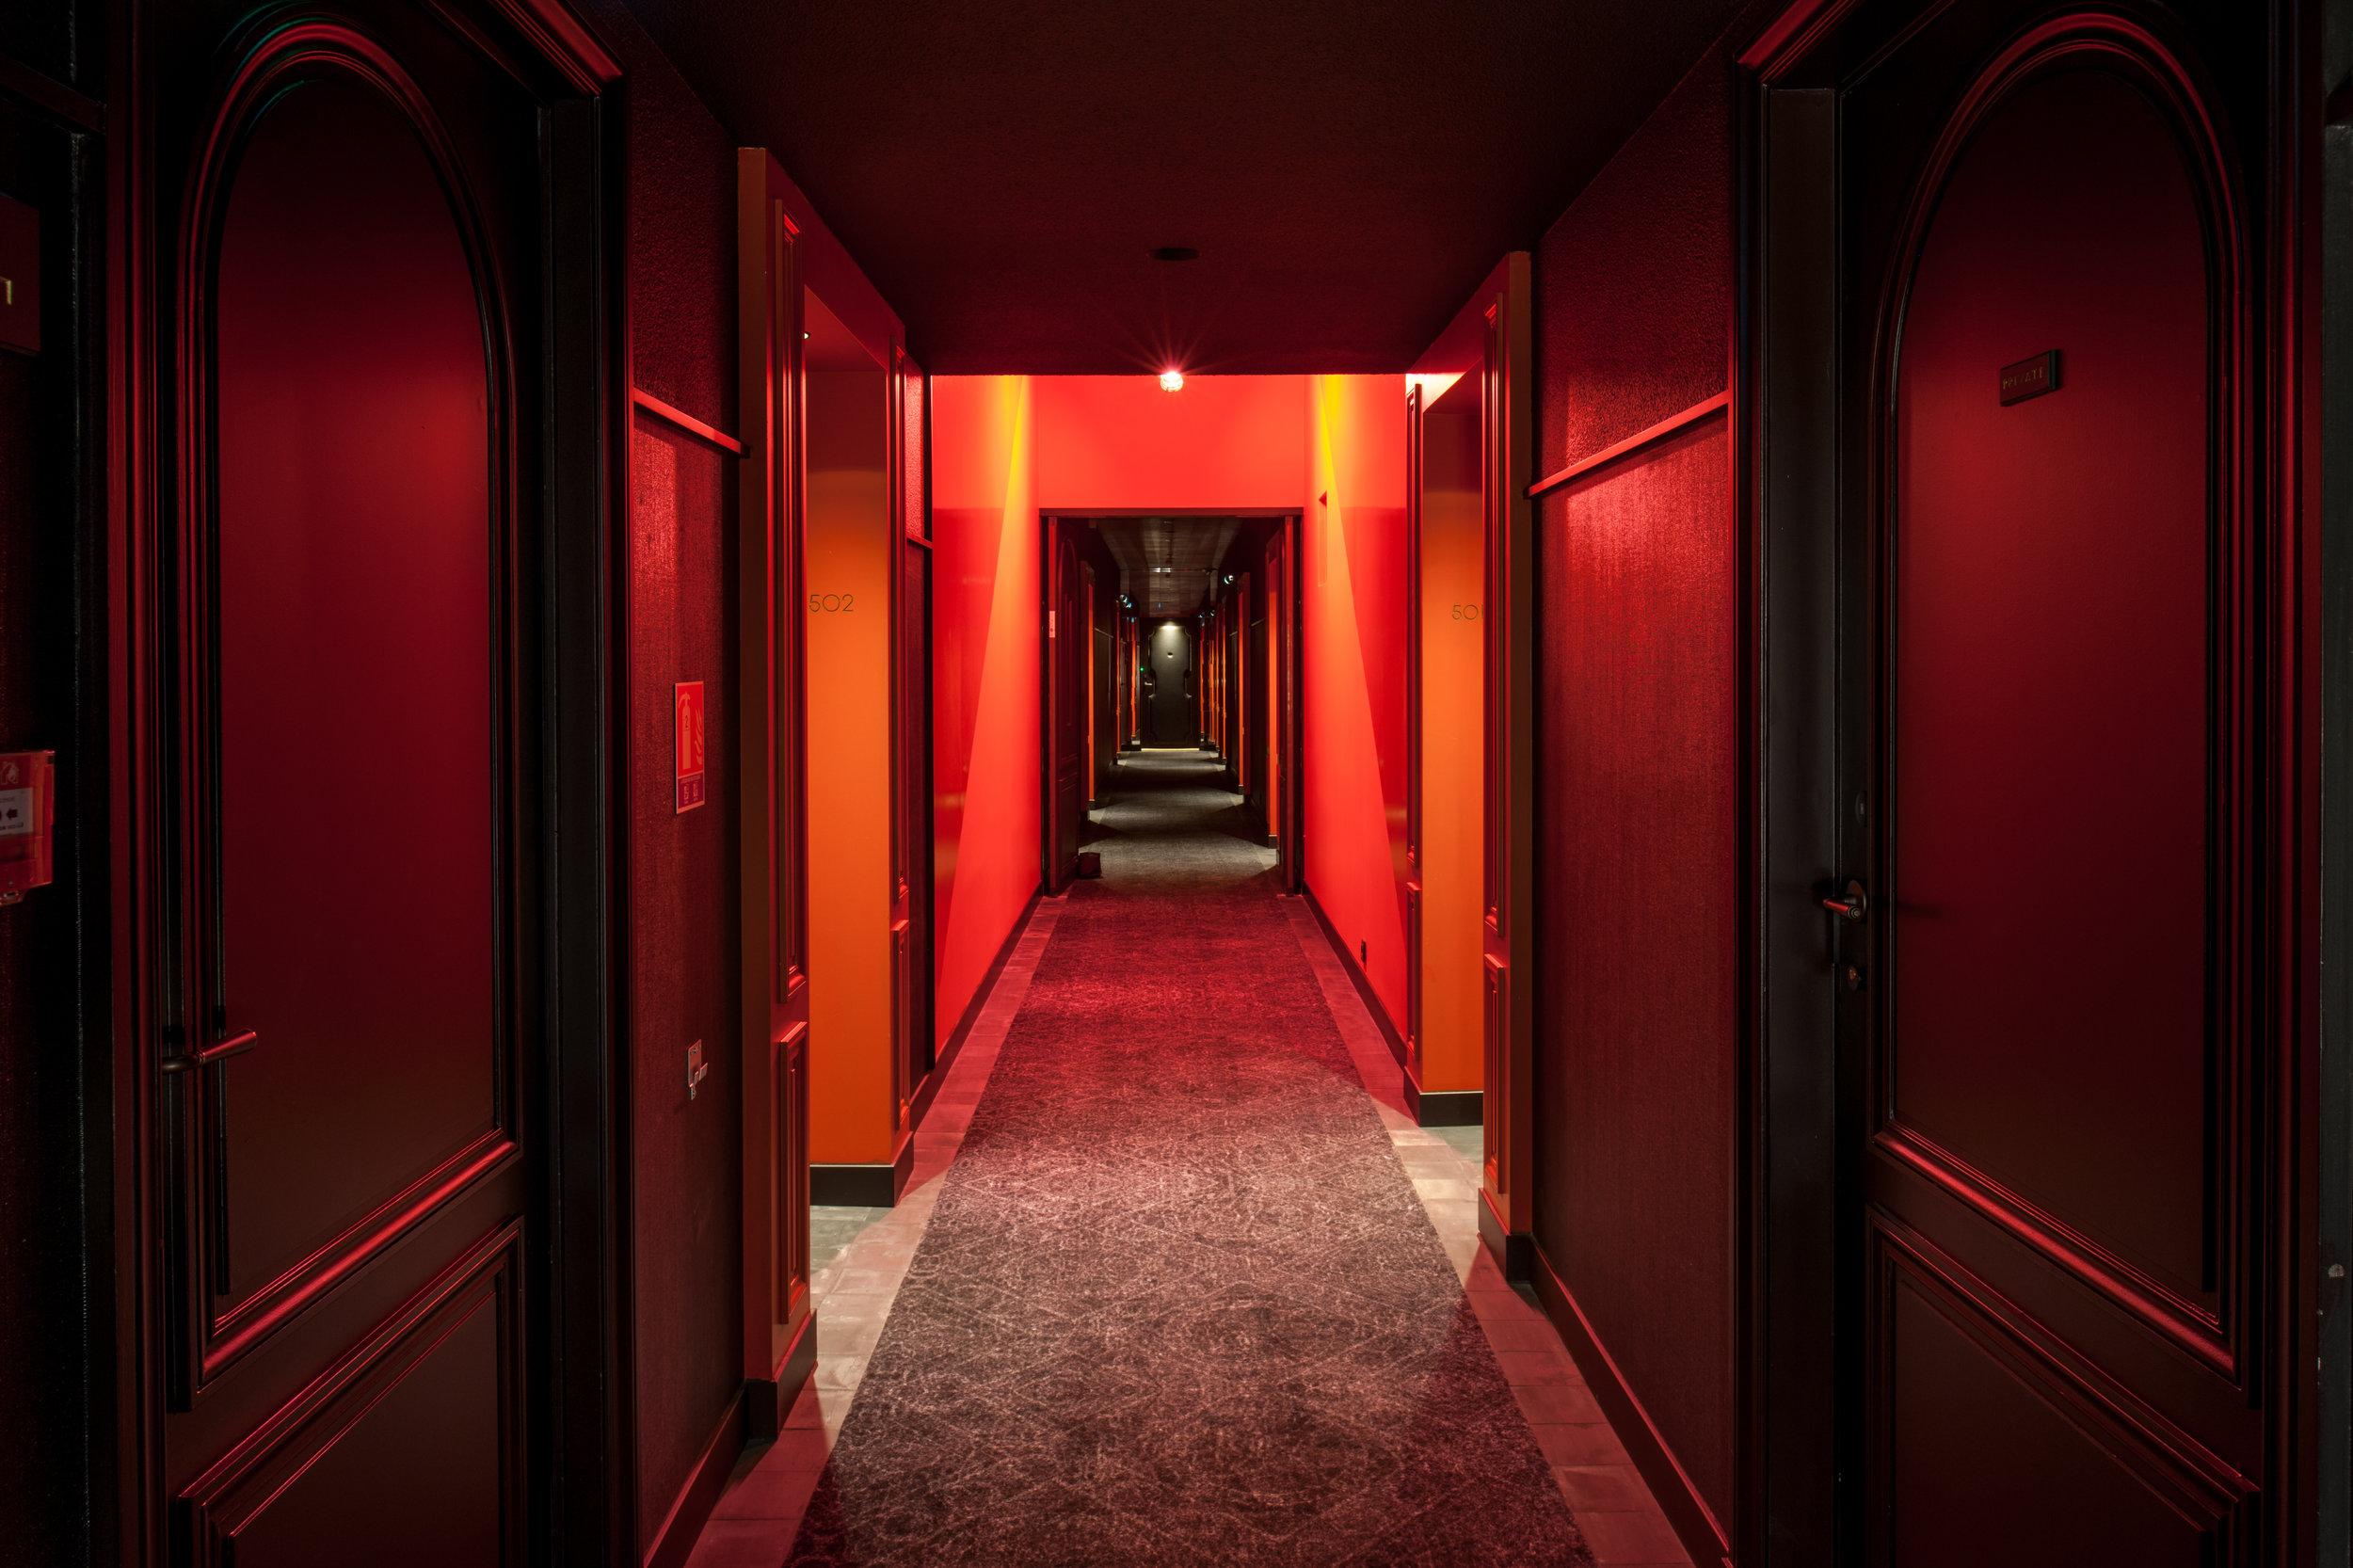 16 - Corridor.jpg